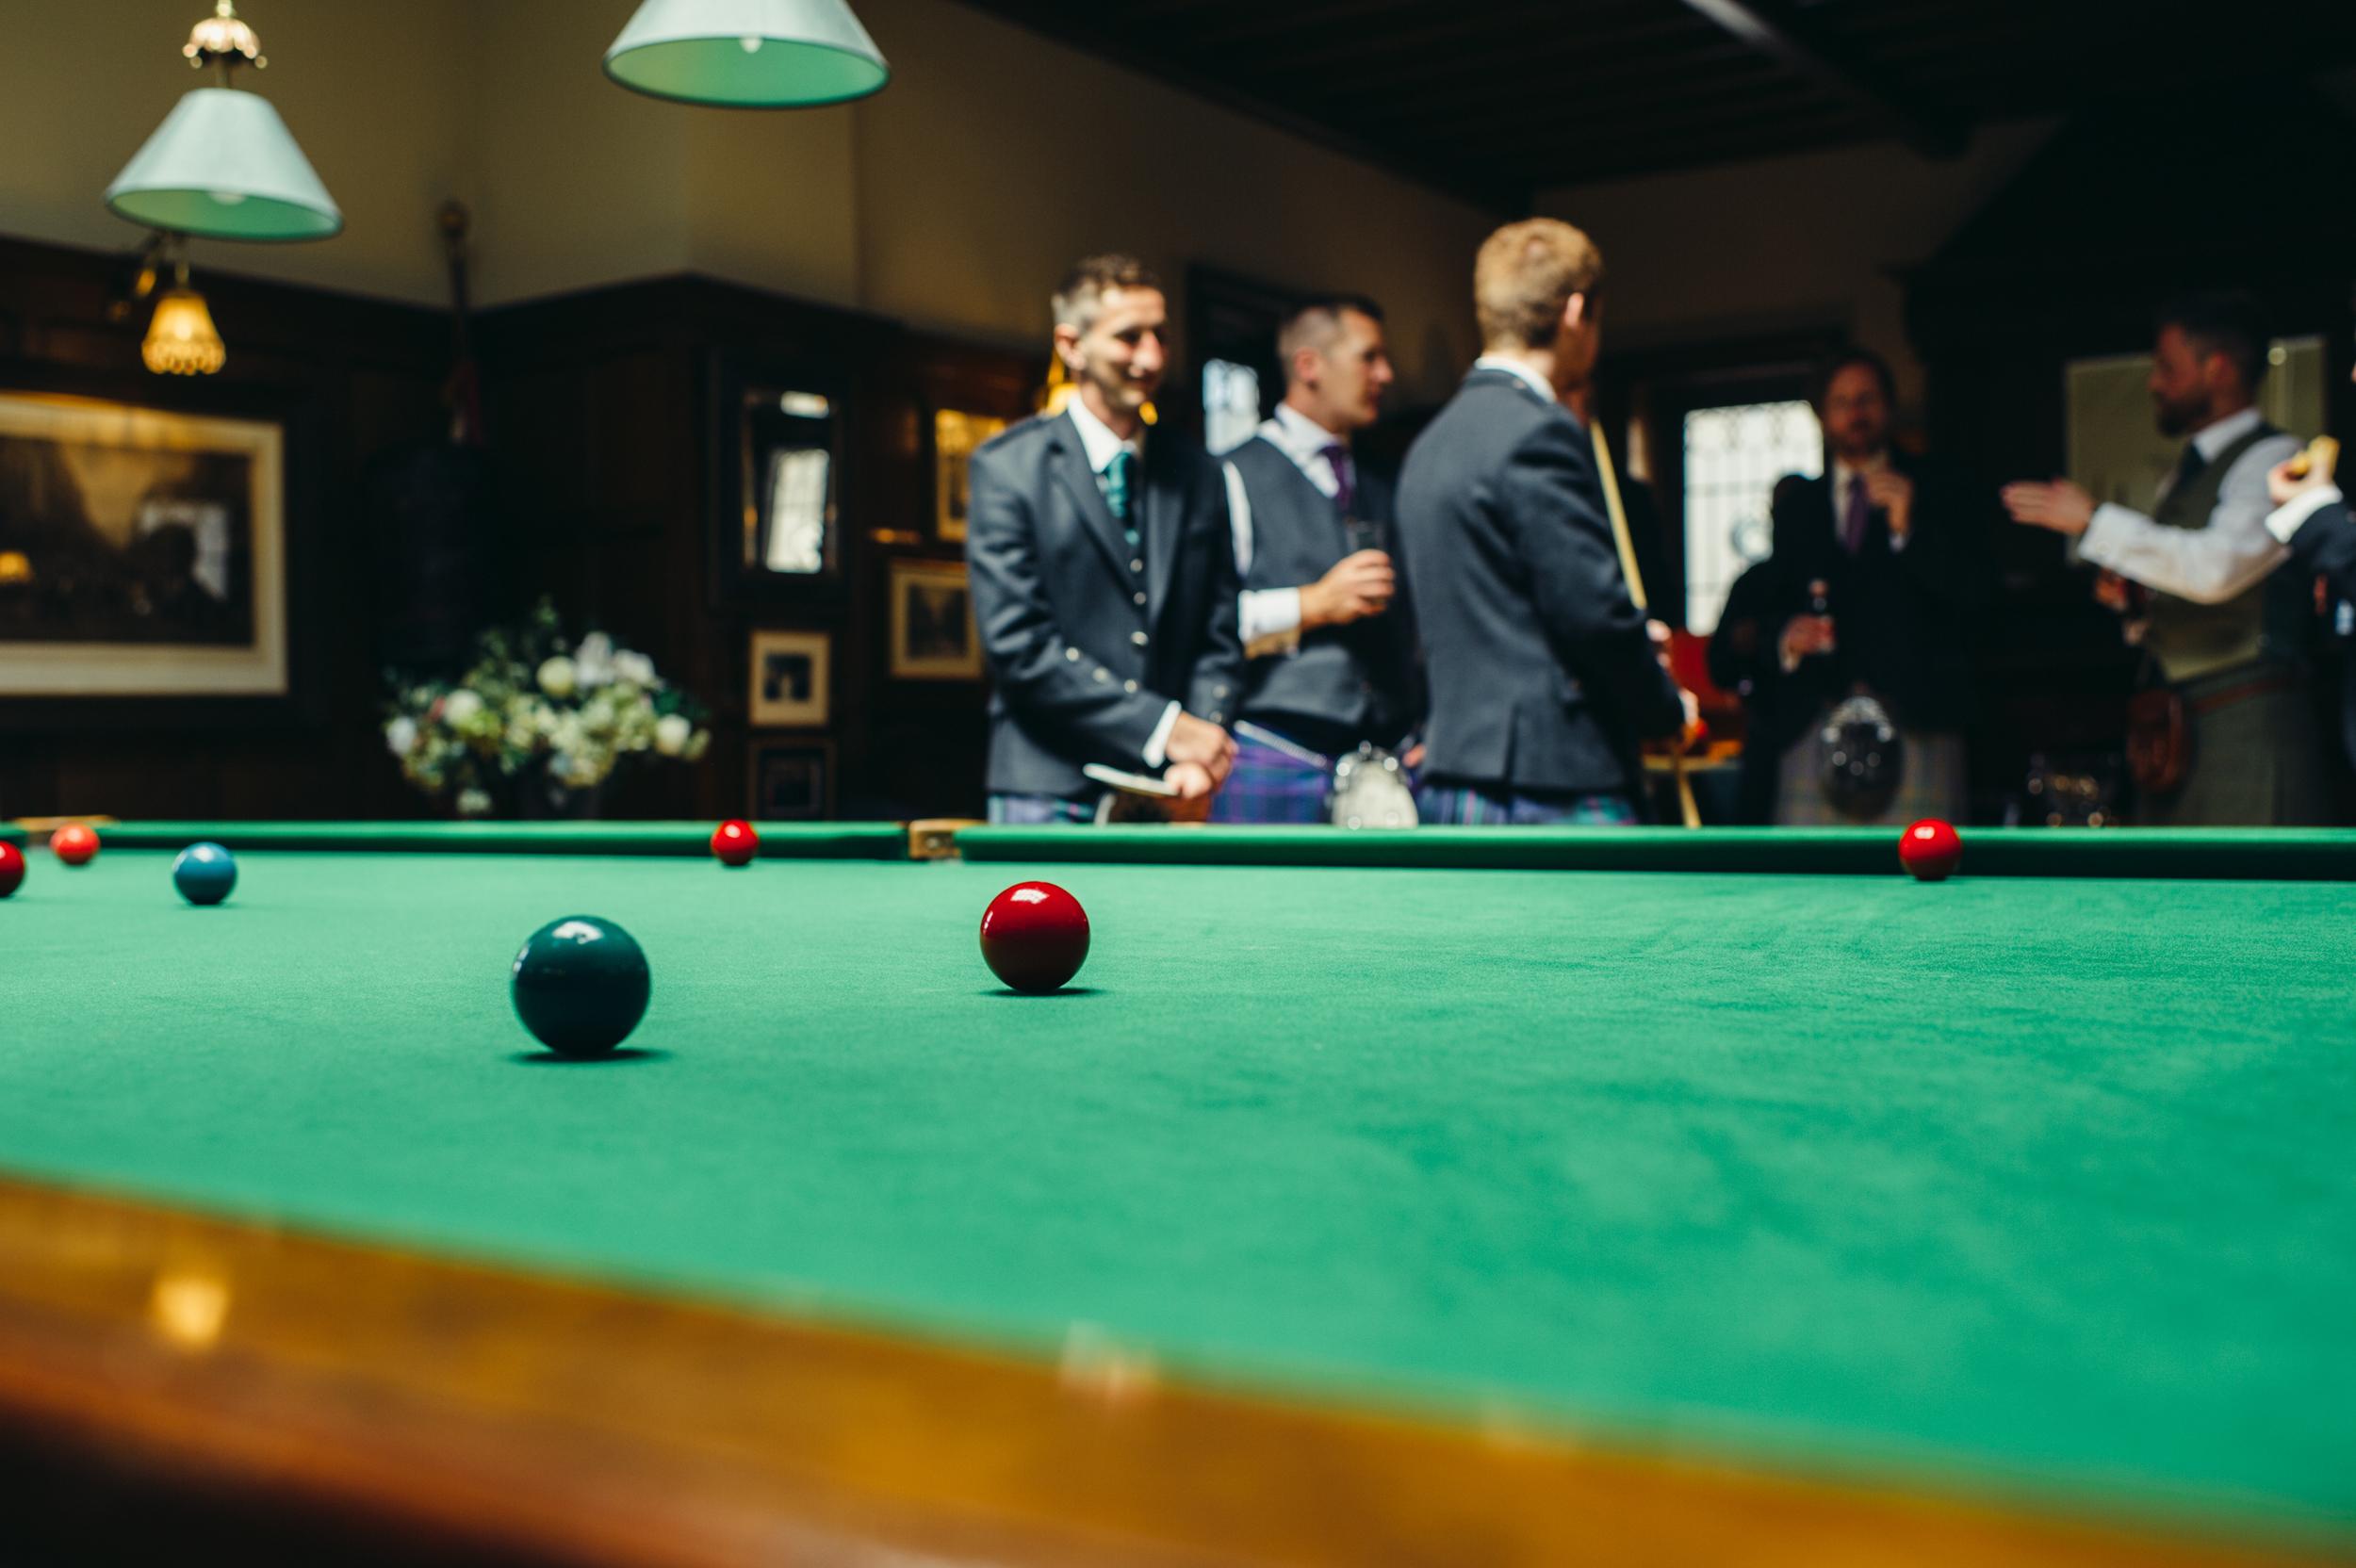 0056-lisa-devine-alternative-creative-wedding-photography-glasgow-edinburgh.JPG